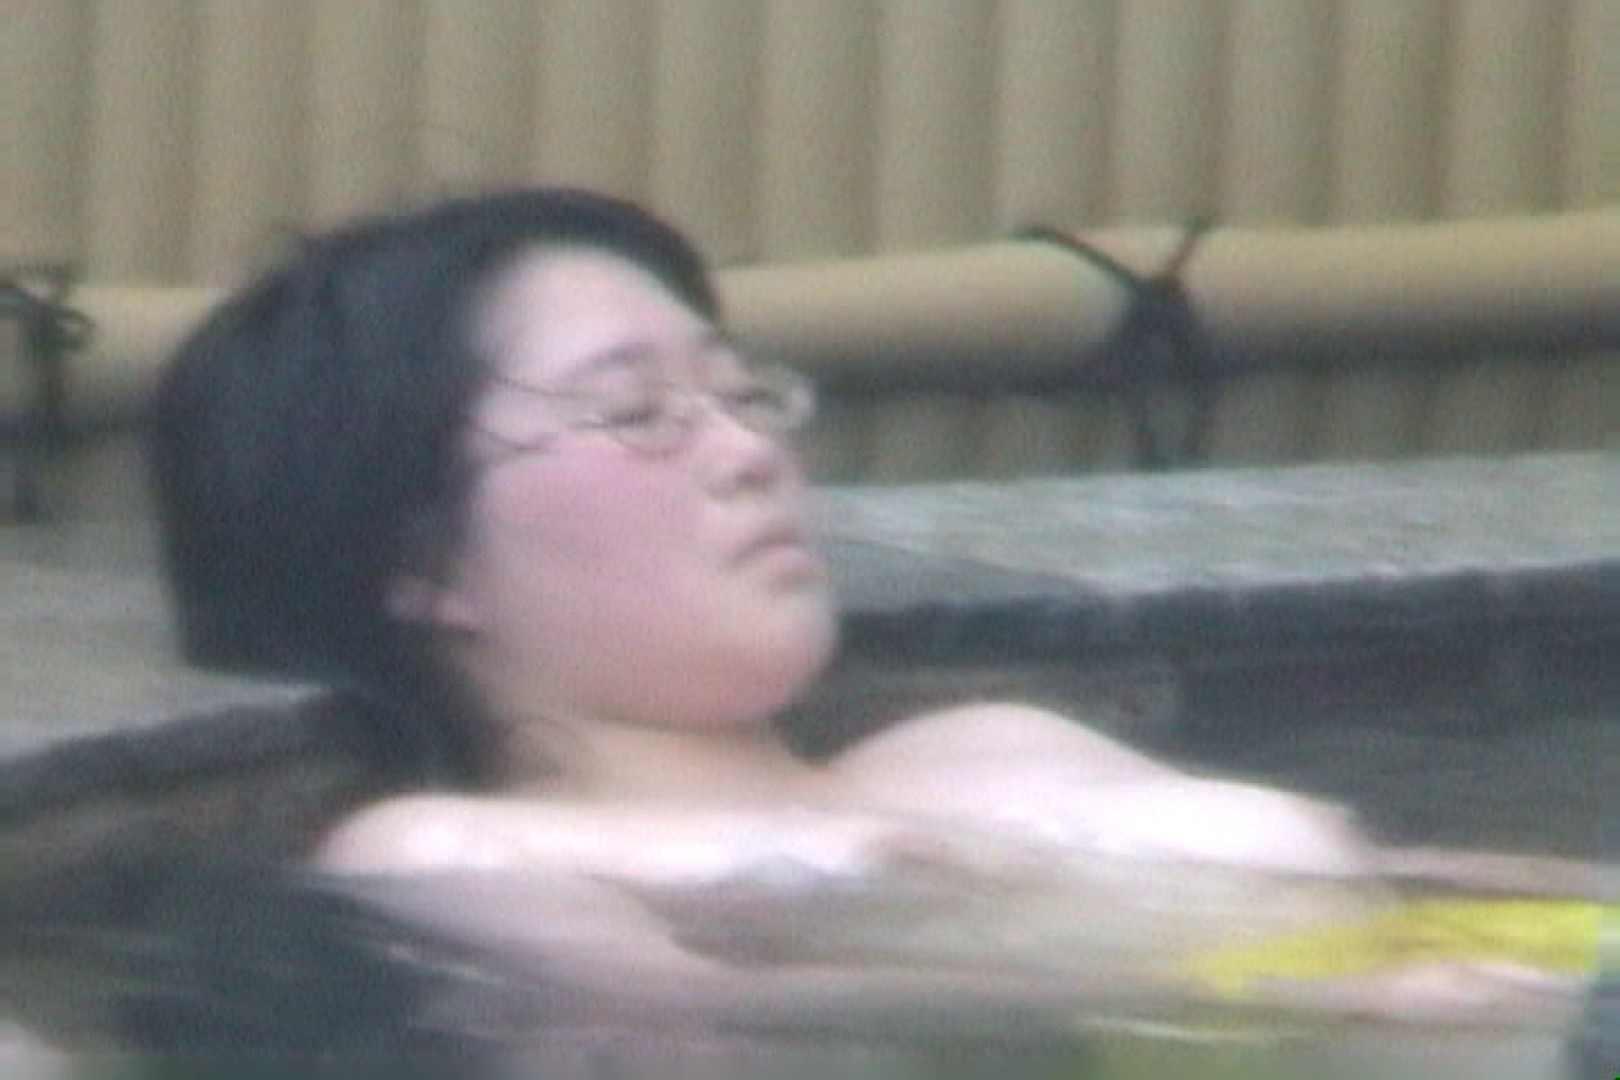 Aquaな露天風呂Vol.46【VIP限定】 女体盗撮  98連発 18